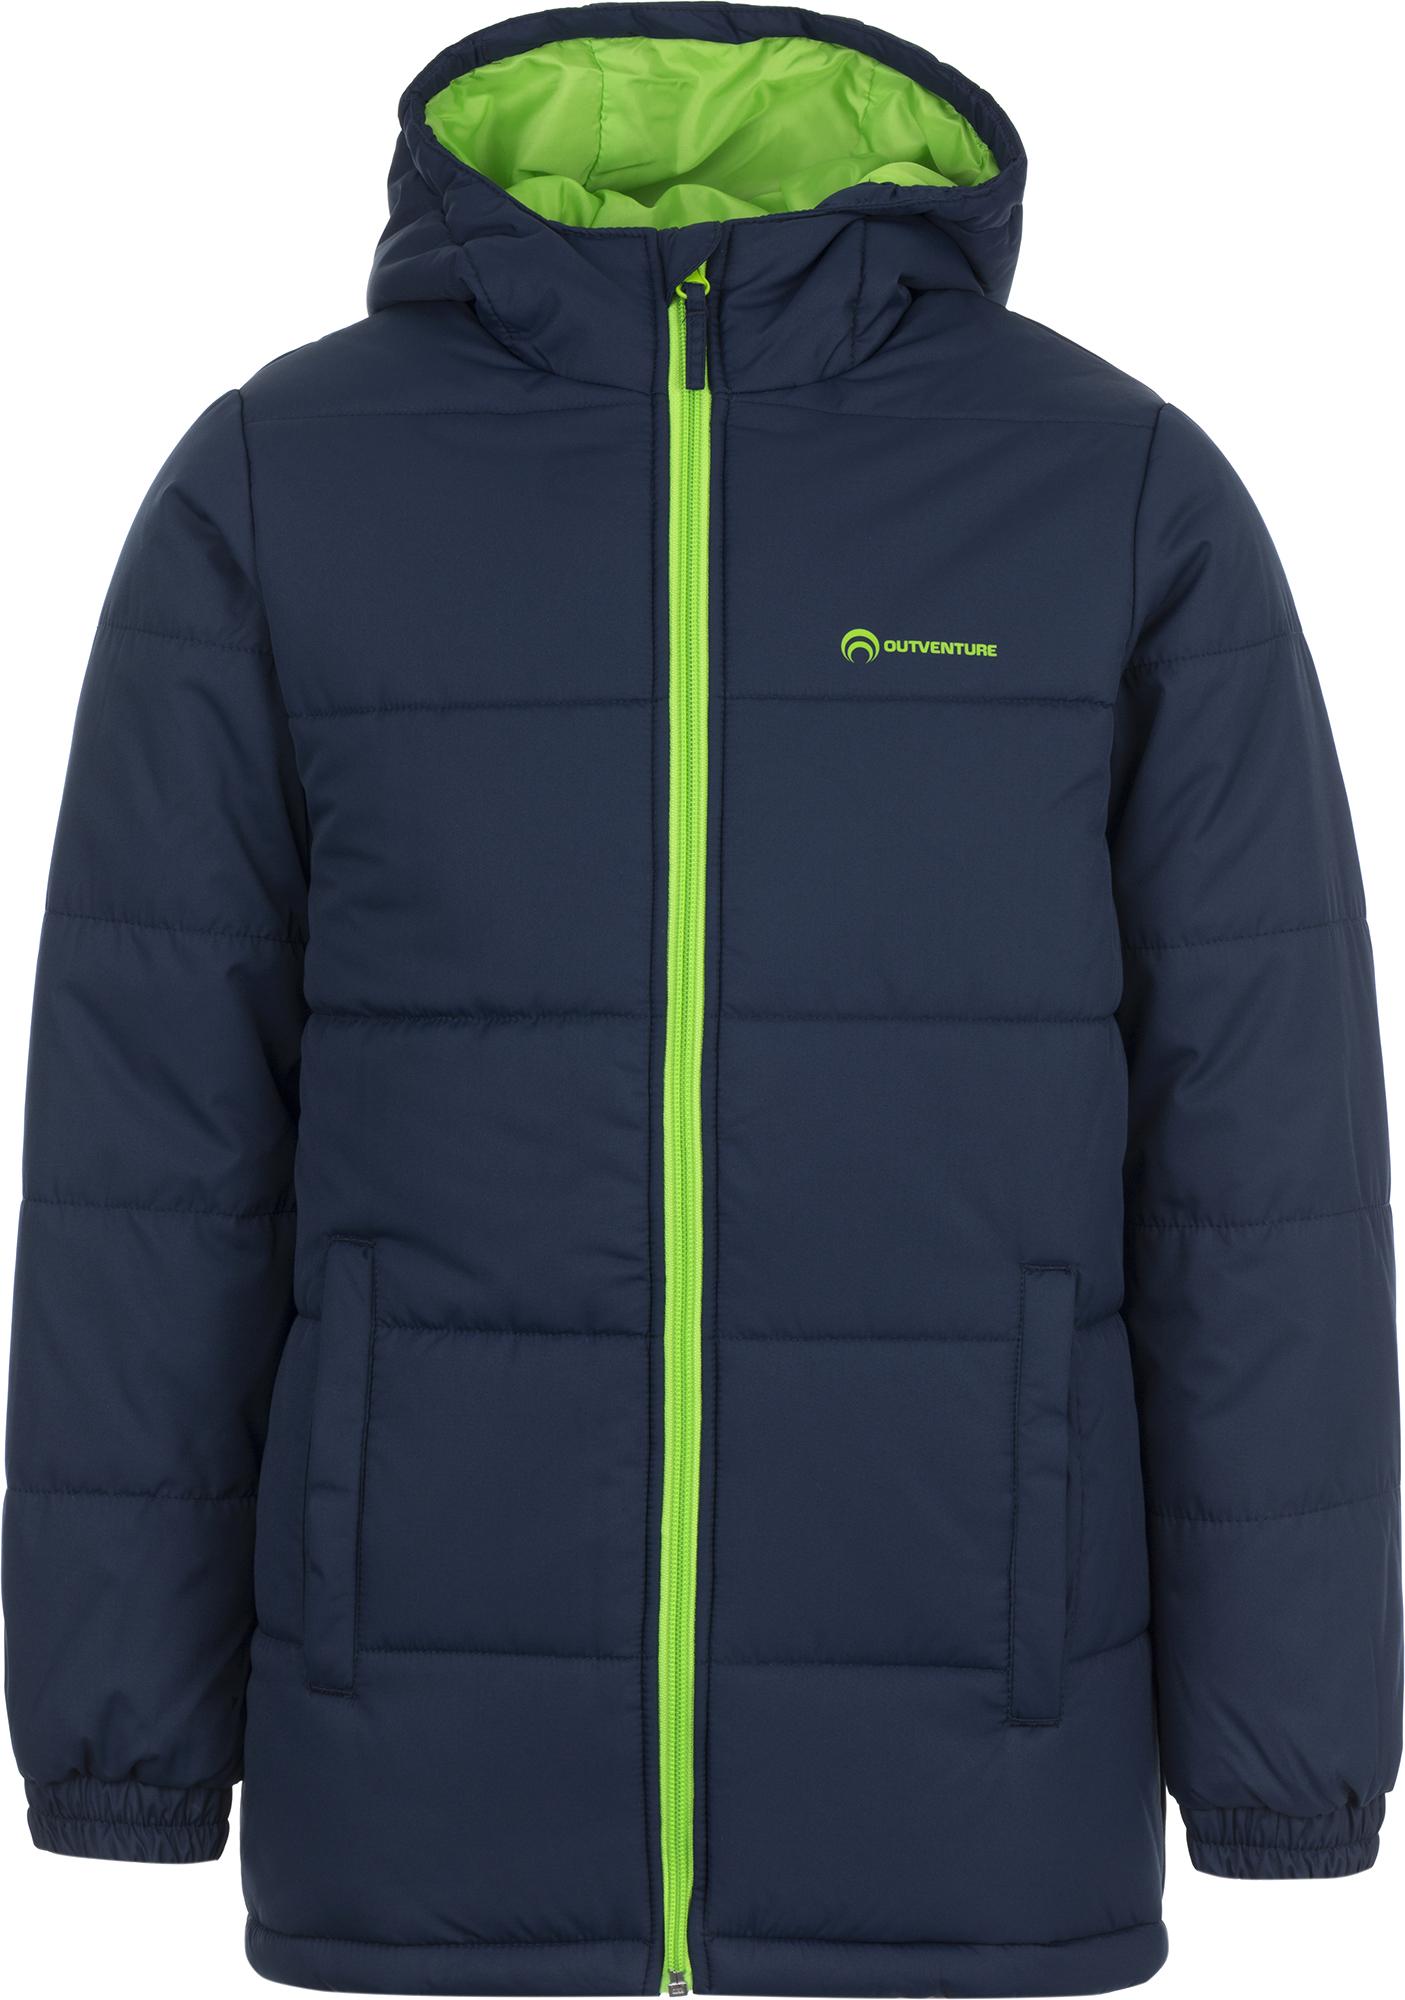 Outventure Куртка утепленная для мальчиков Outventure outventure куртка утепленная для девочек outventure